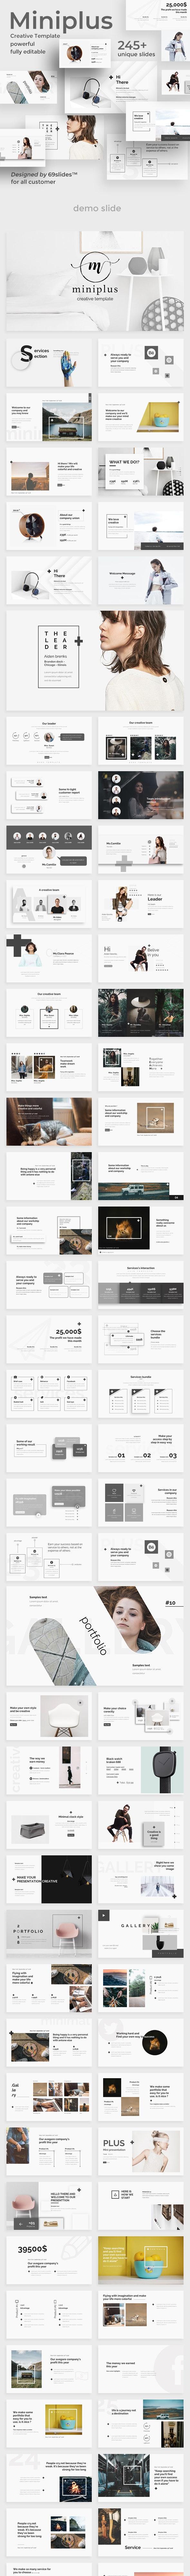 Miniplus Creative Powerpoint Template - Creative PowerPoint Templates